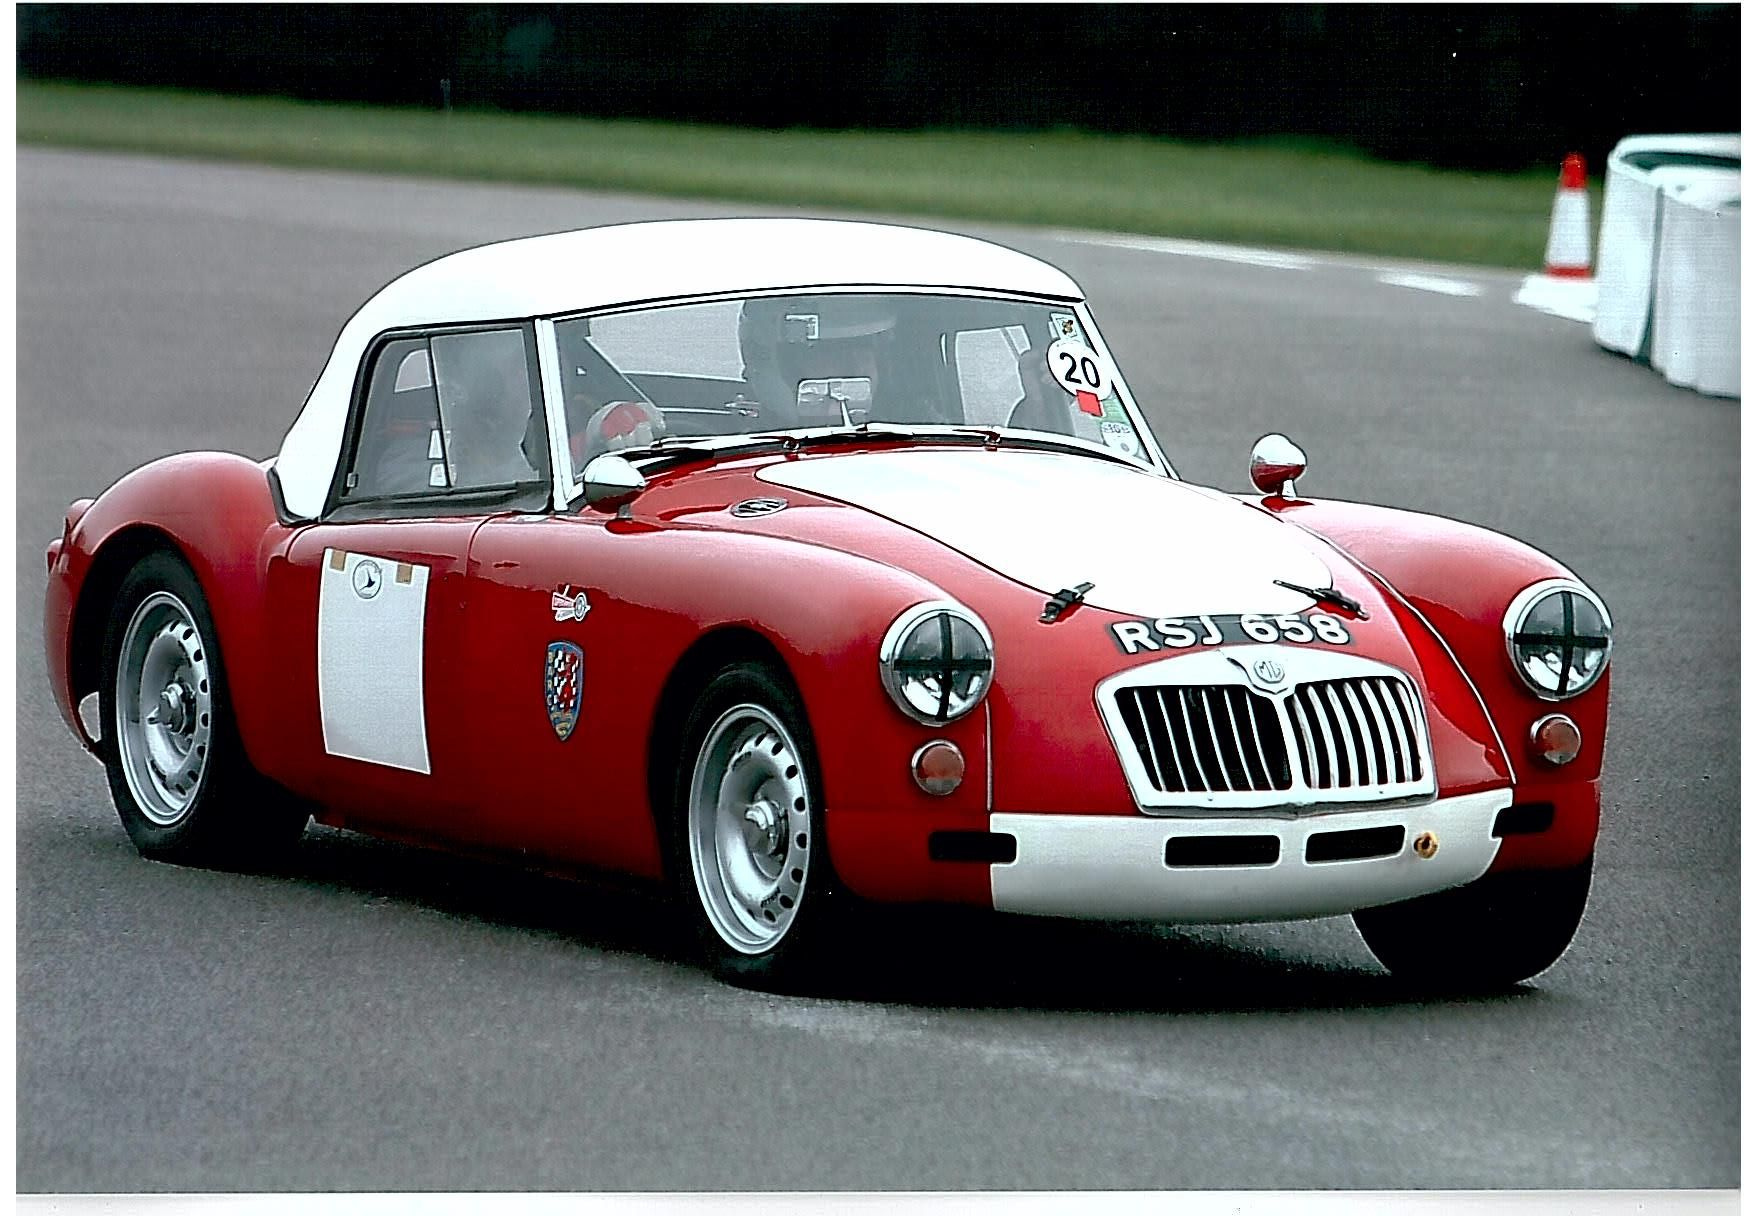 Mg Rsj Goodwood British Sports Cars Goodwood Morris Garages